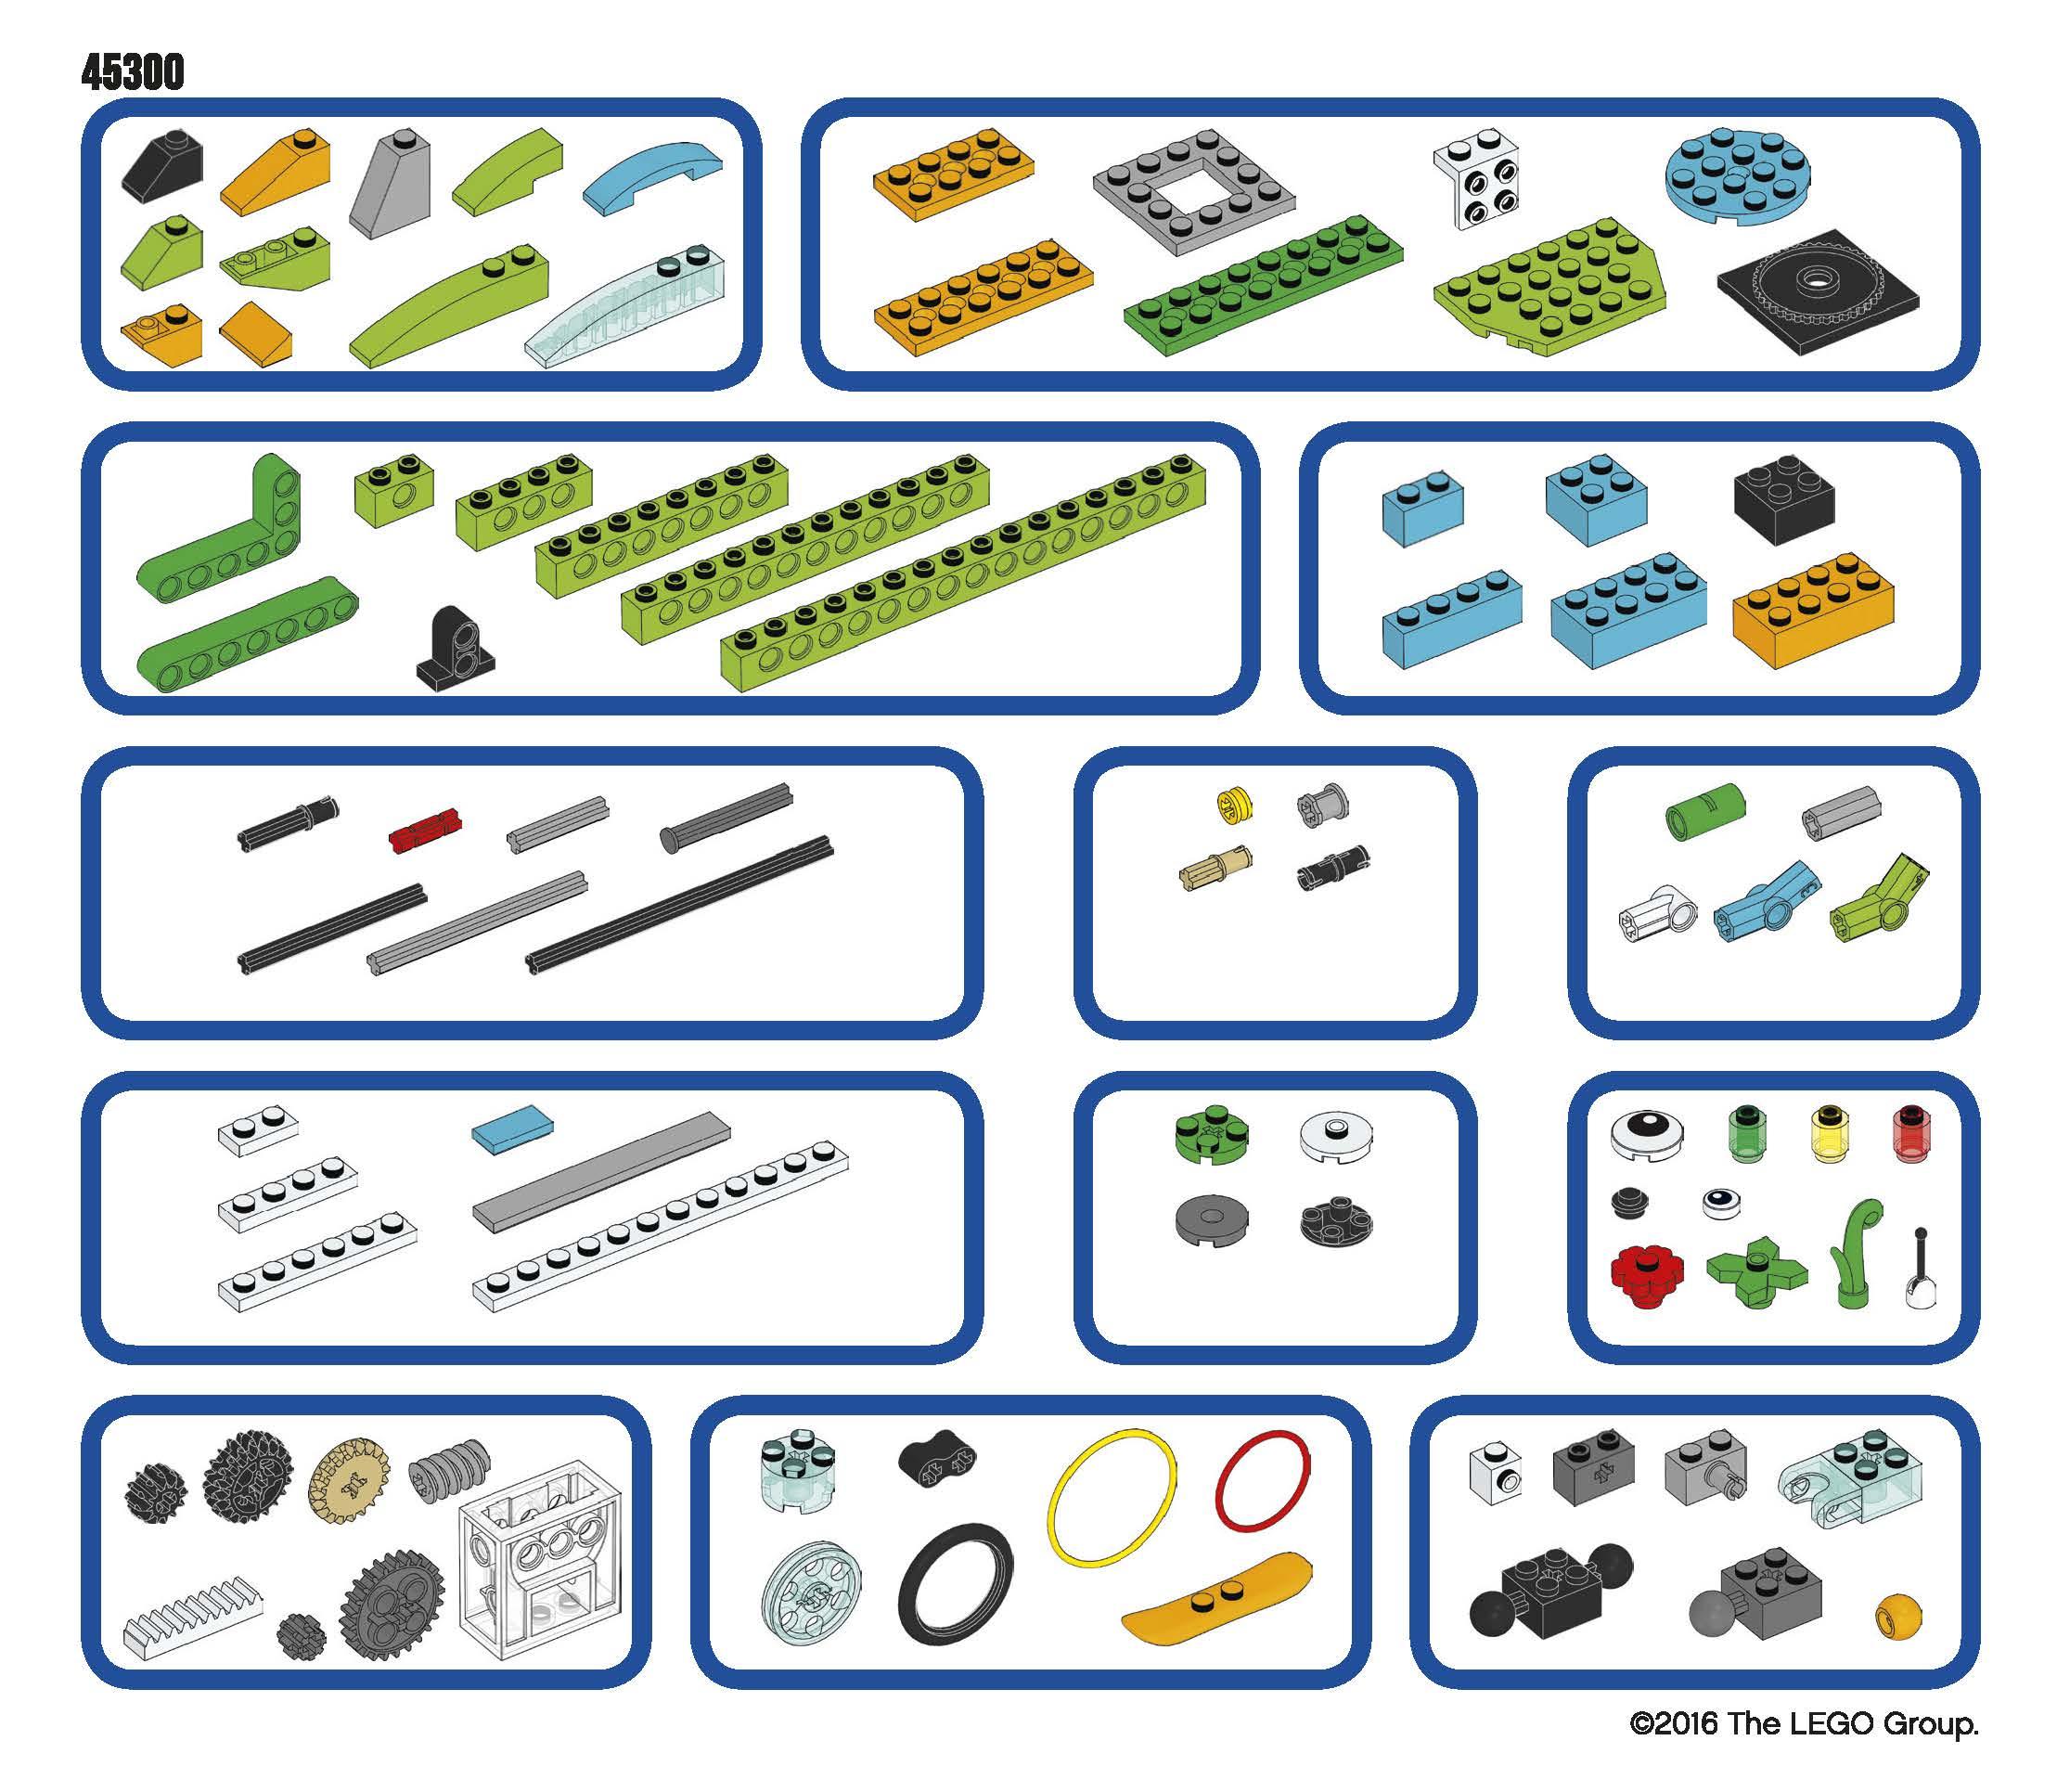 WeDo 2.0 Sorting Tray Sticker Sheet for Print